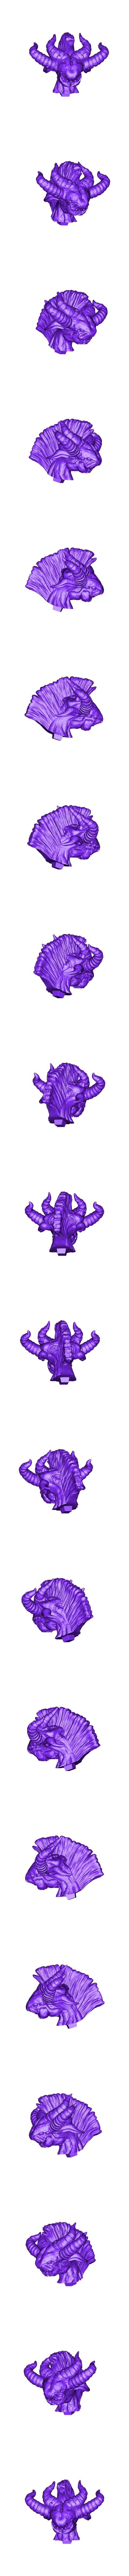 head2.stl Download free STL file Tikbalan • 3D printer design, duncanshadow